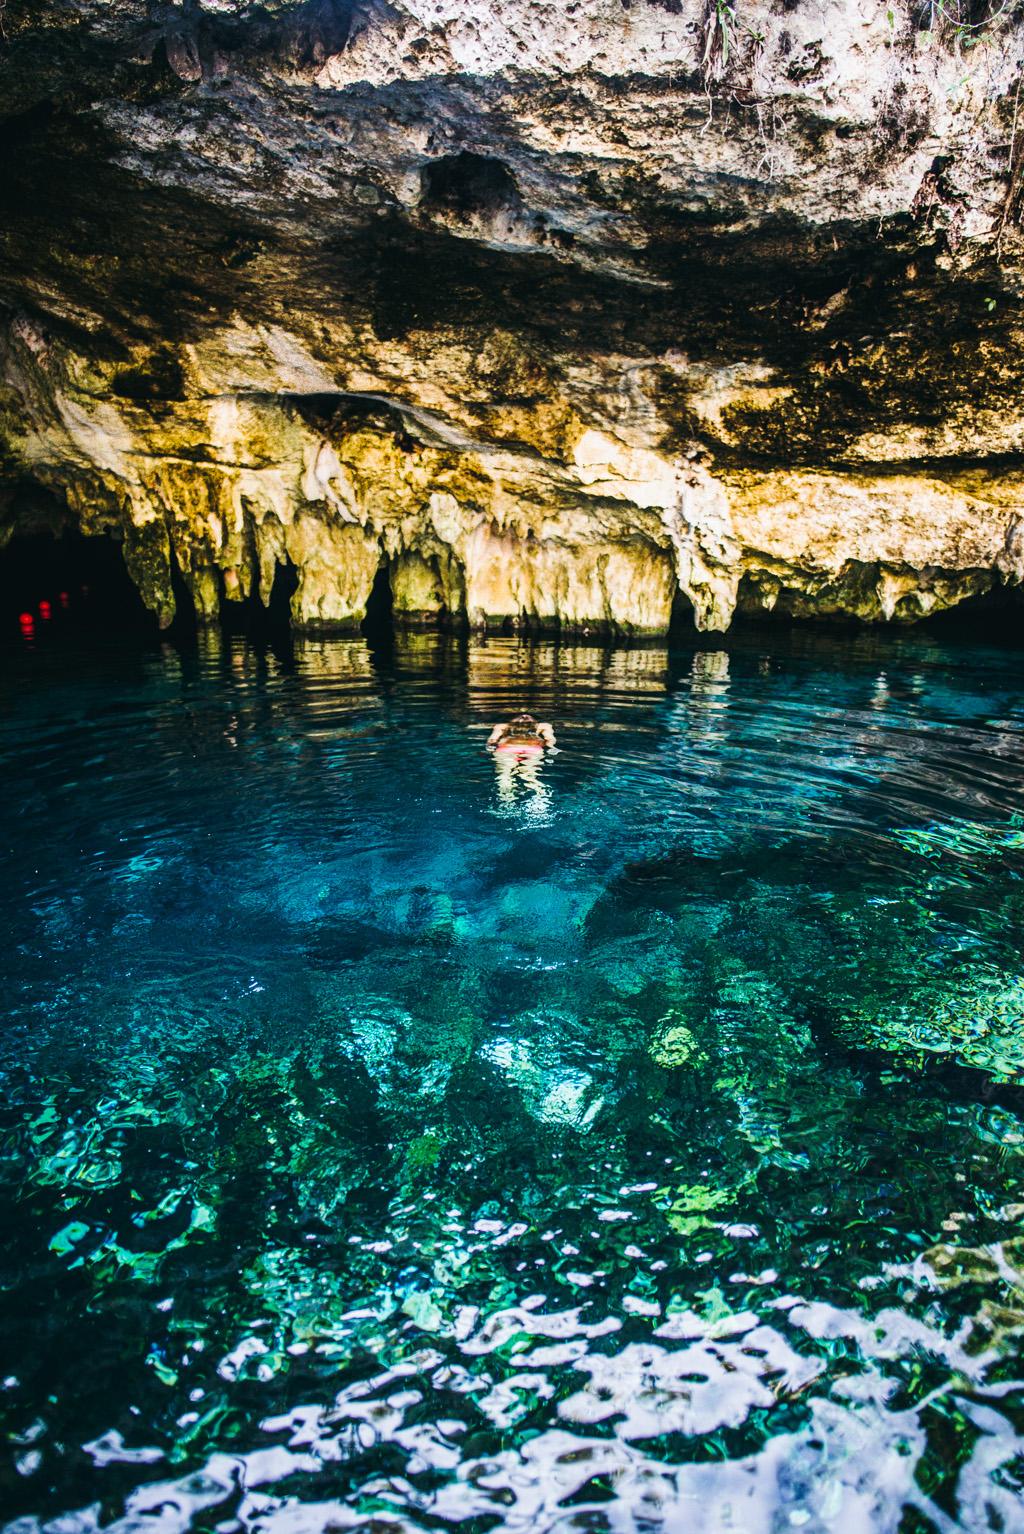 janni-deler-cenote-tulumDSC_3188